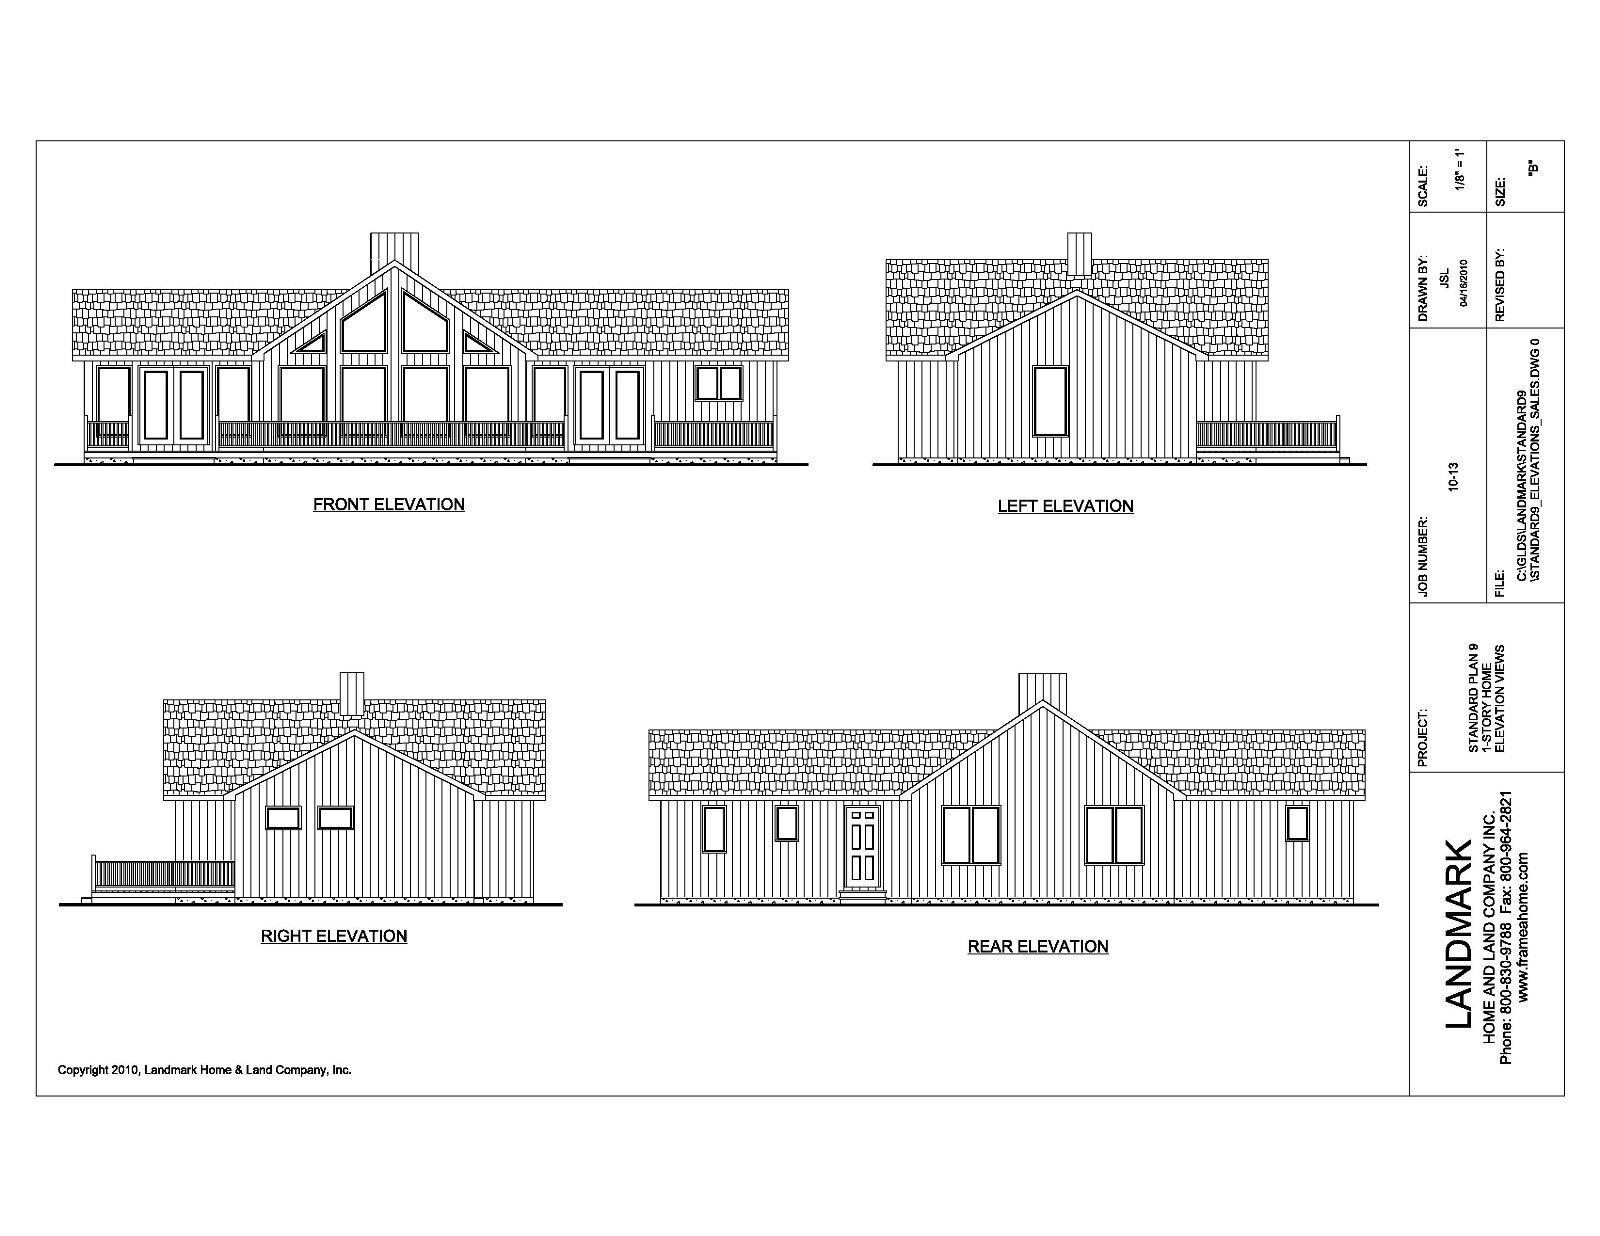 Kit homes house by landmark home land co prefab house home for 6 bedroom kit homes